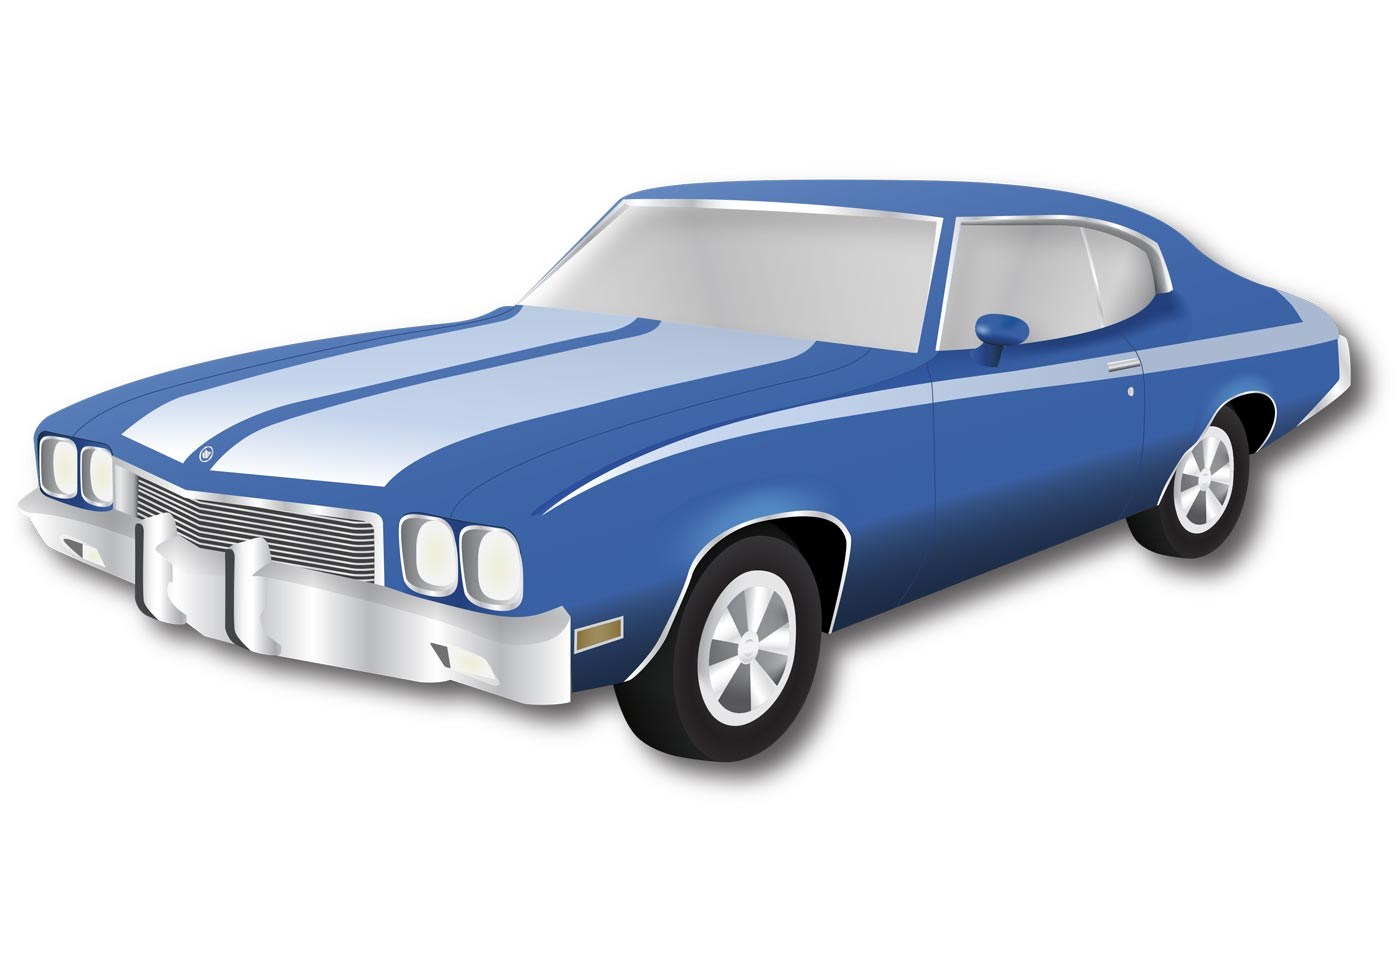 buick skylark car vector free vector art at vecteezy auto repair logo clip art auto repair logo design